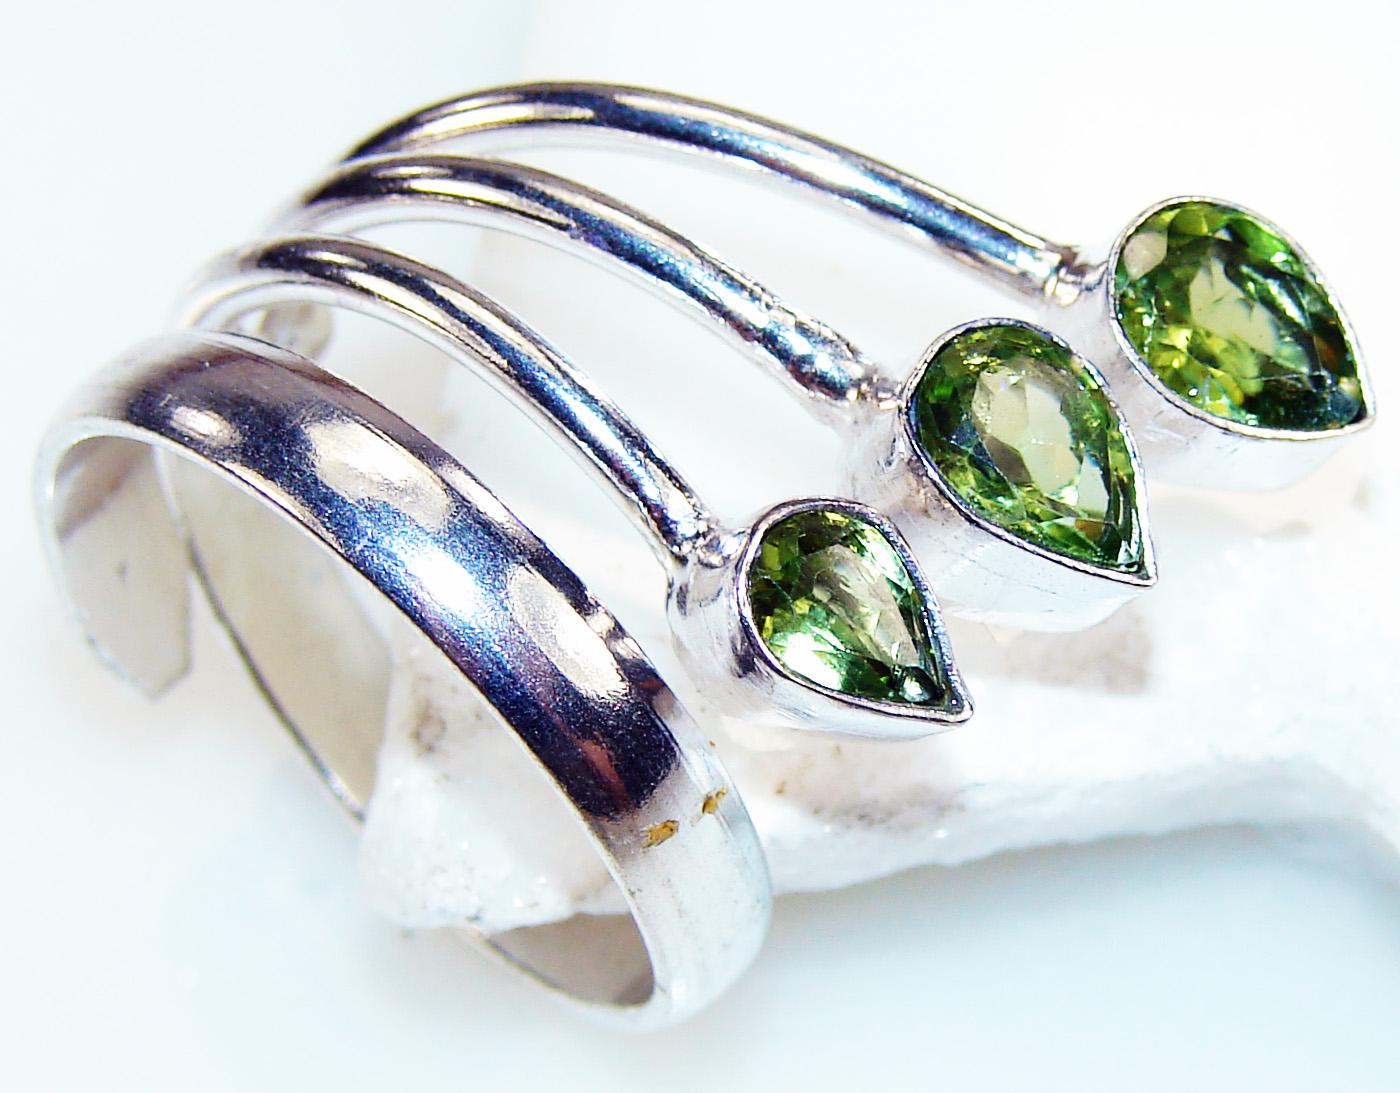 Silver Jewelry Gemstone Peridot Ring Size 9.5 Handmade Sterling Silver Peridot Ring at Sears.com